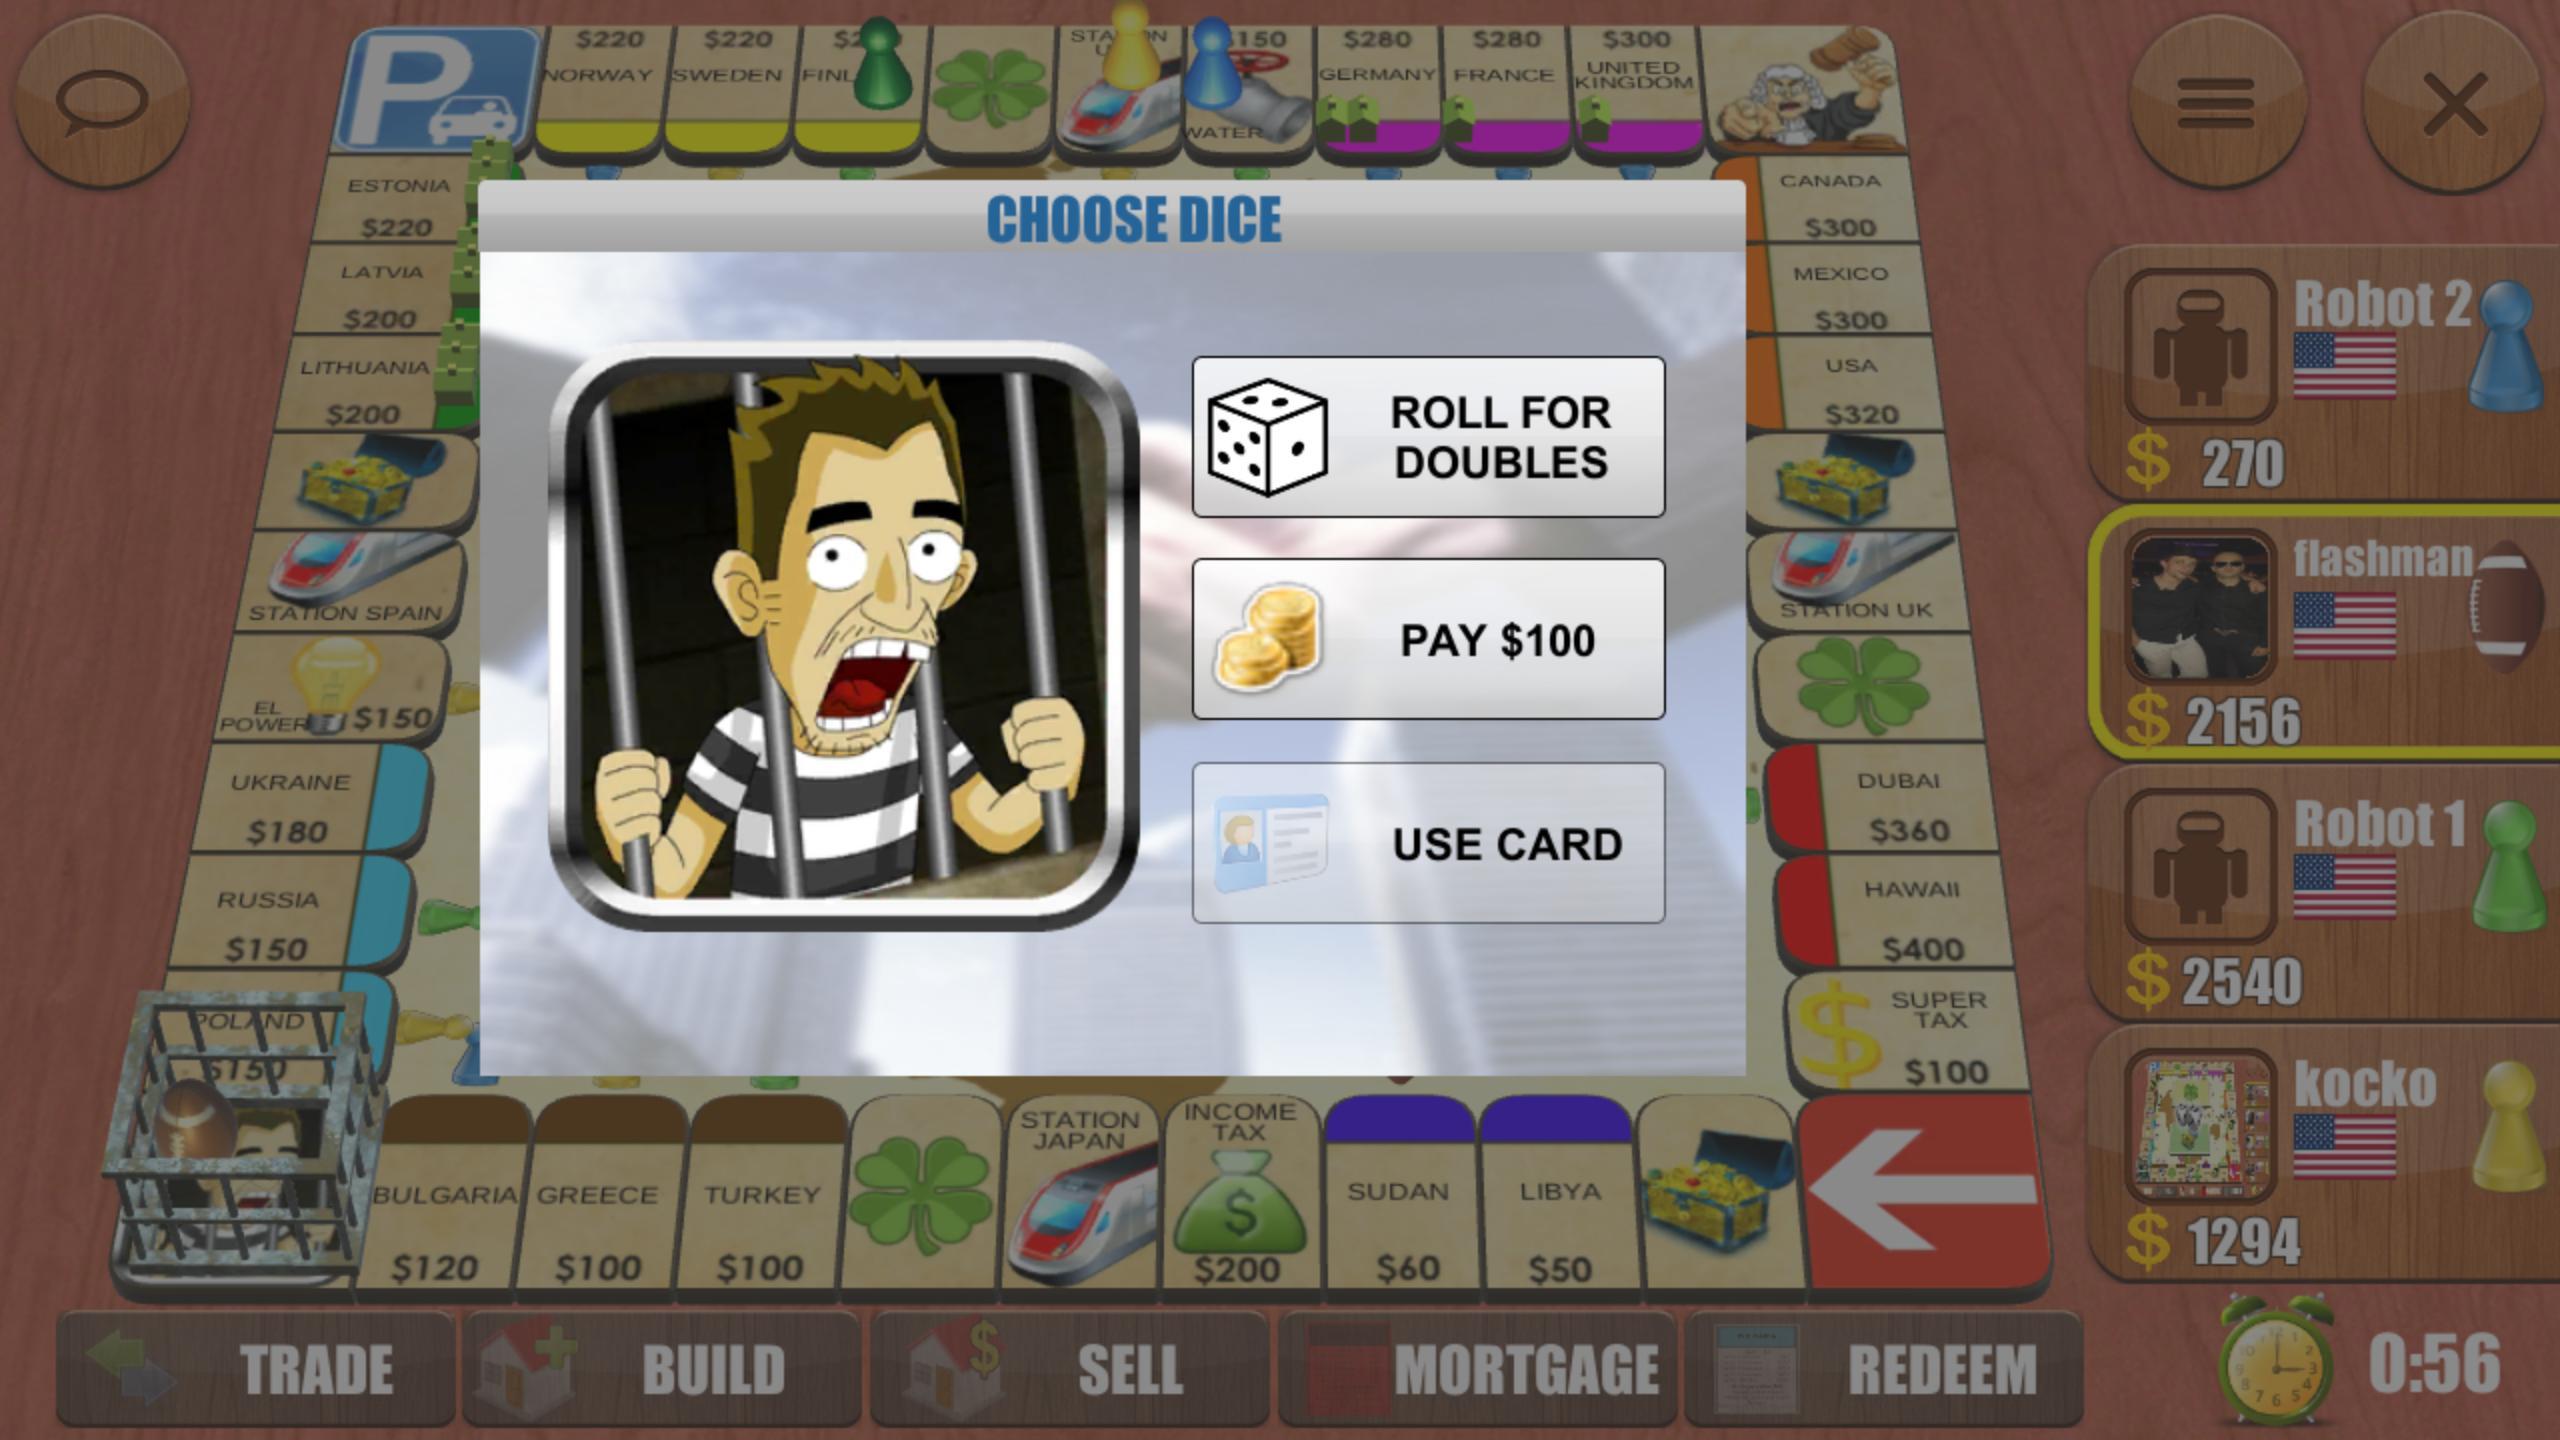 Rento Dice Board Game Online 5.1.9 Screenshot 12